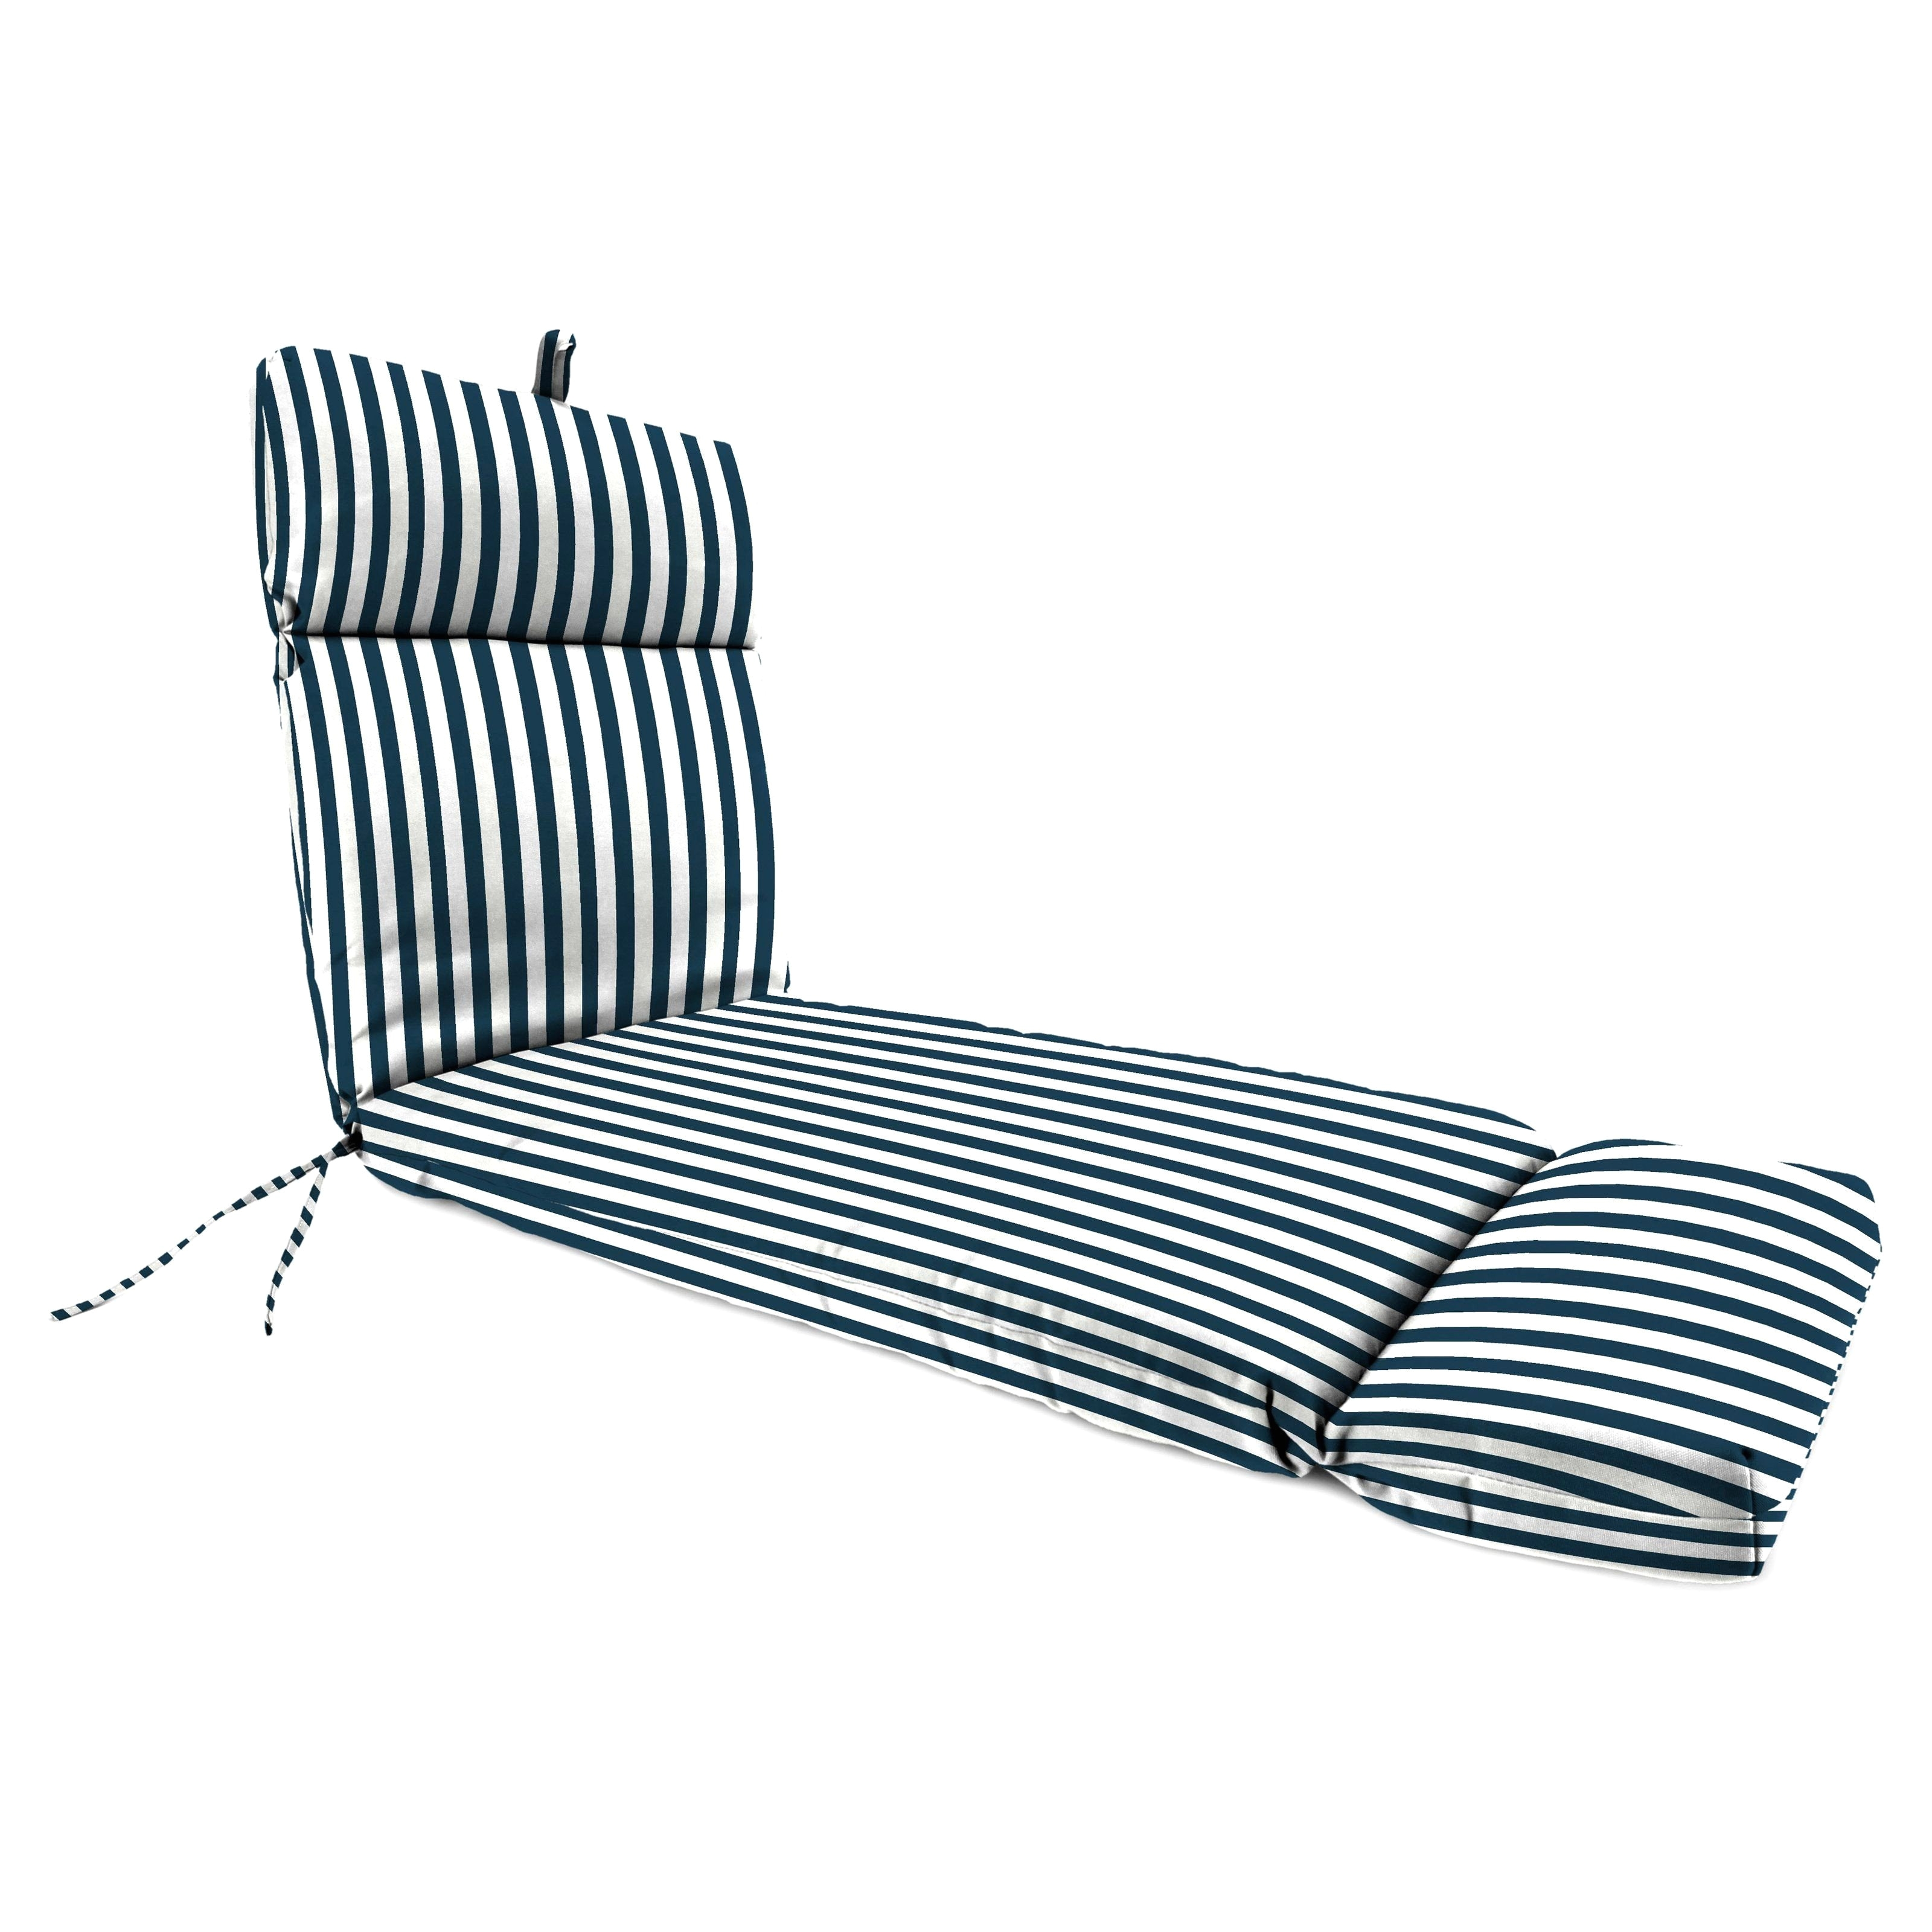 Leather sofa Living Room Decor Best Navy Blue Leather sofa Fresh Mid Century Design Best